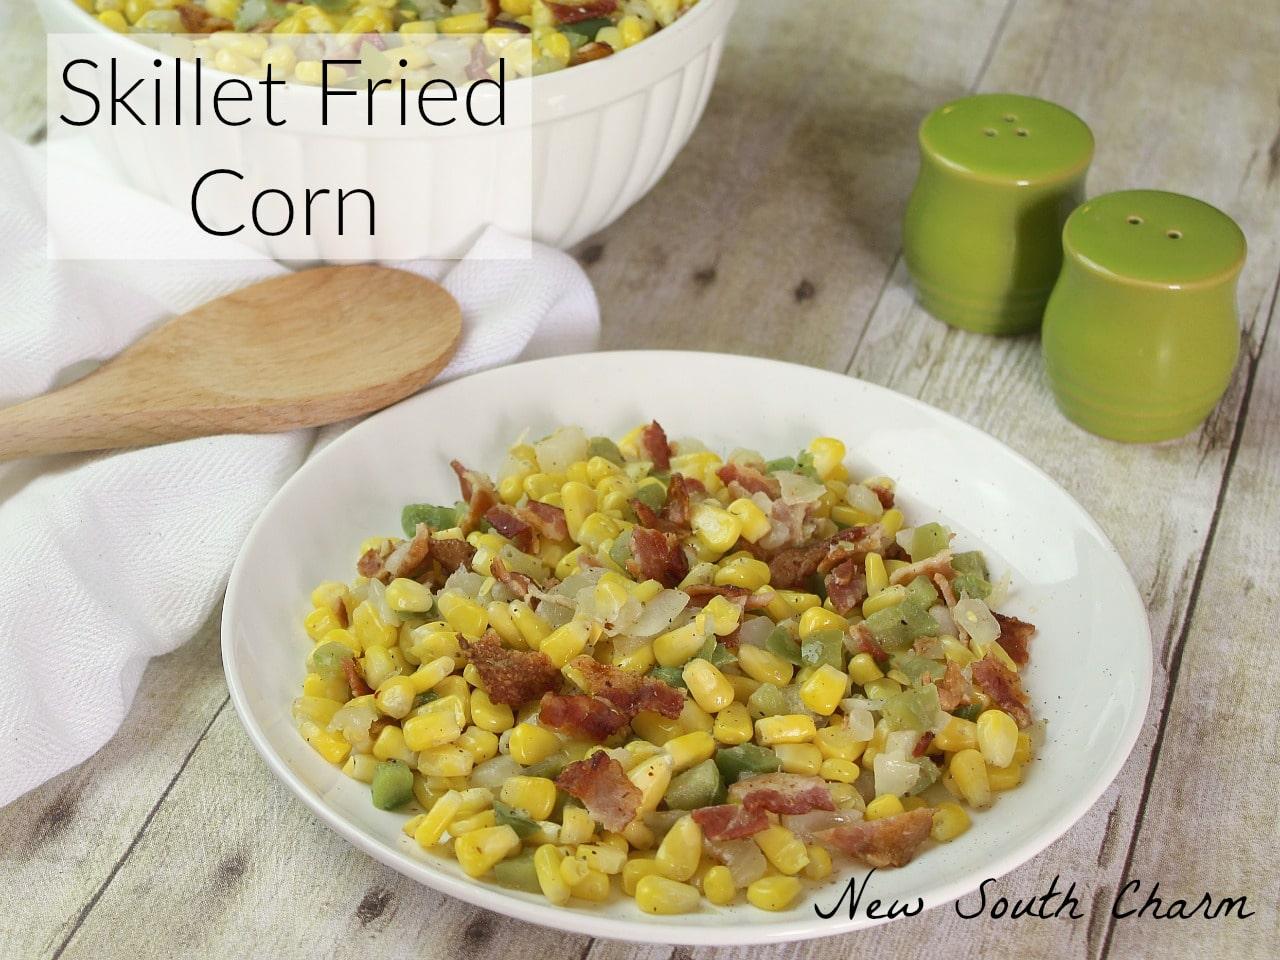 Skillet Fried Corn Recipe